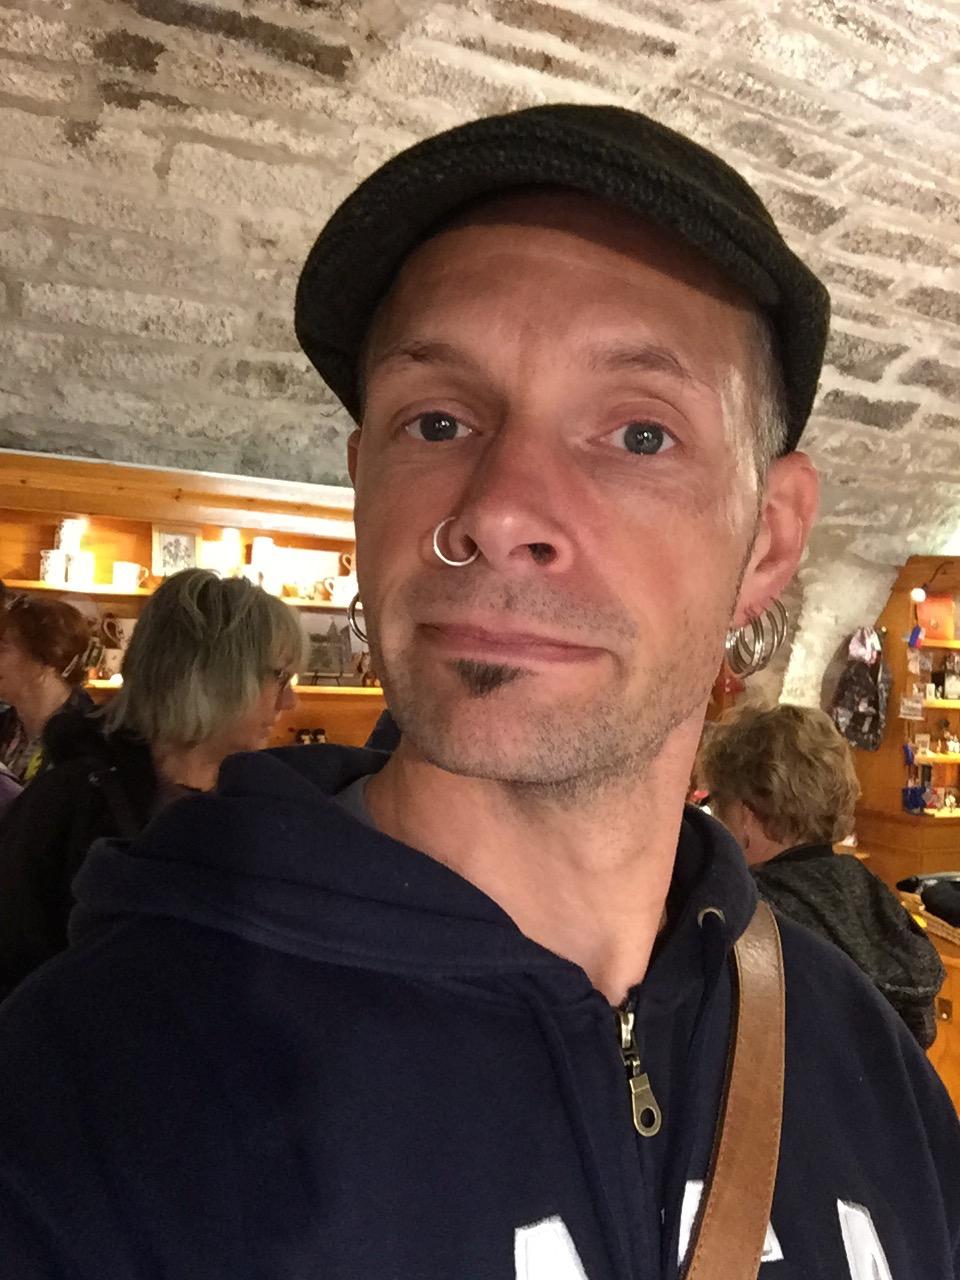 Joakim Flisberg